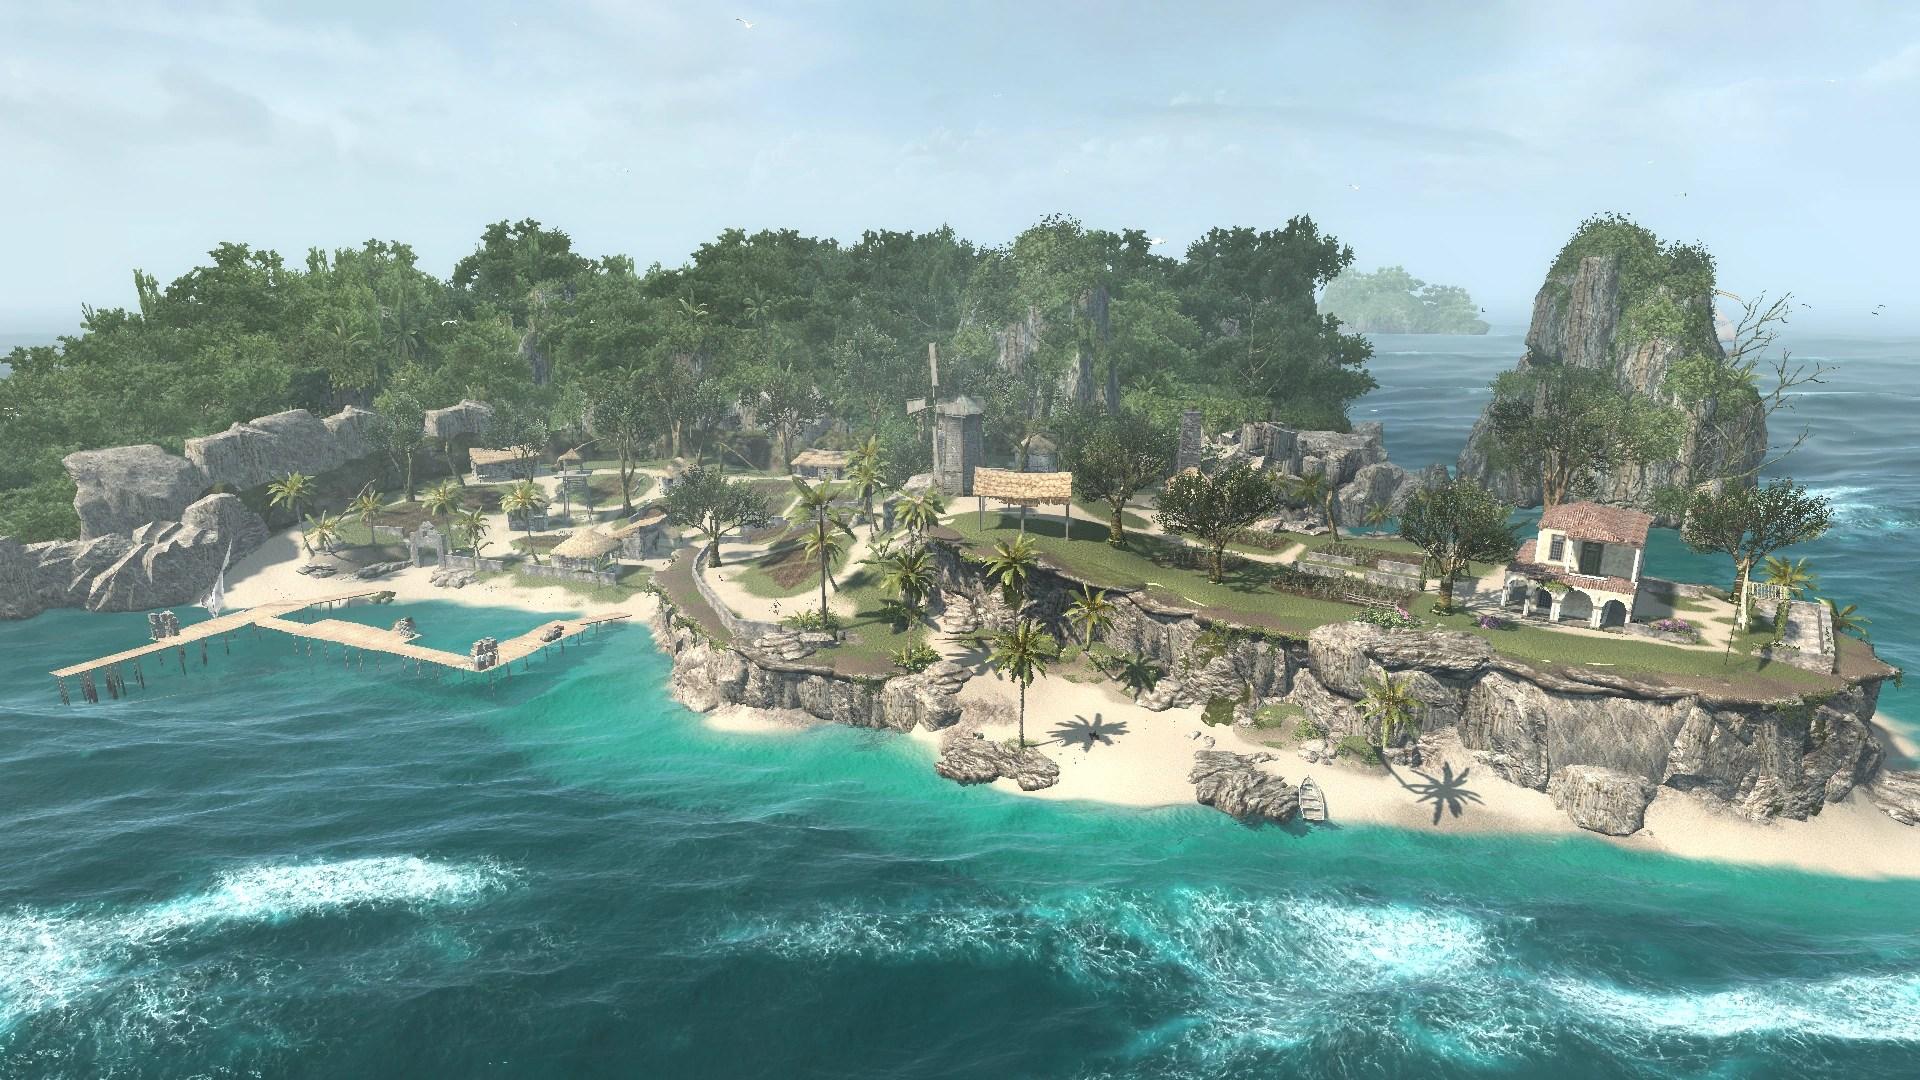 Black Desert Hd Wallpaper Tortuga Assassin S Creed Wiki Fandom Powered By Wikia